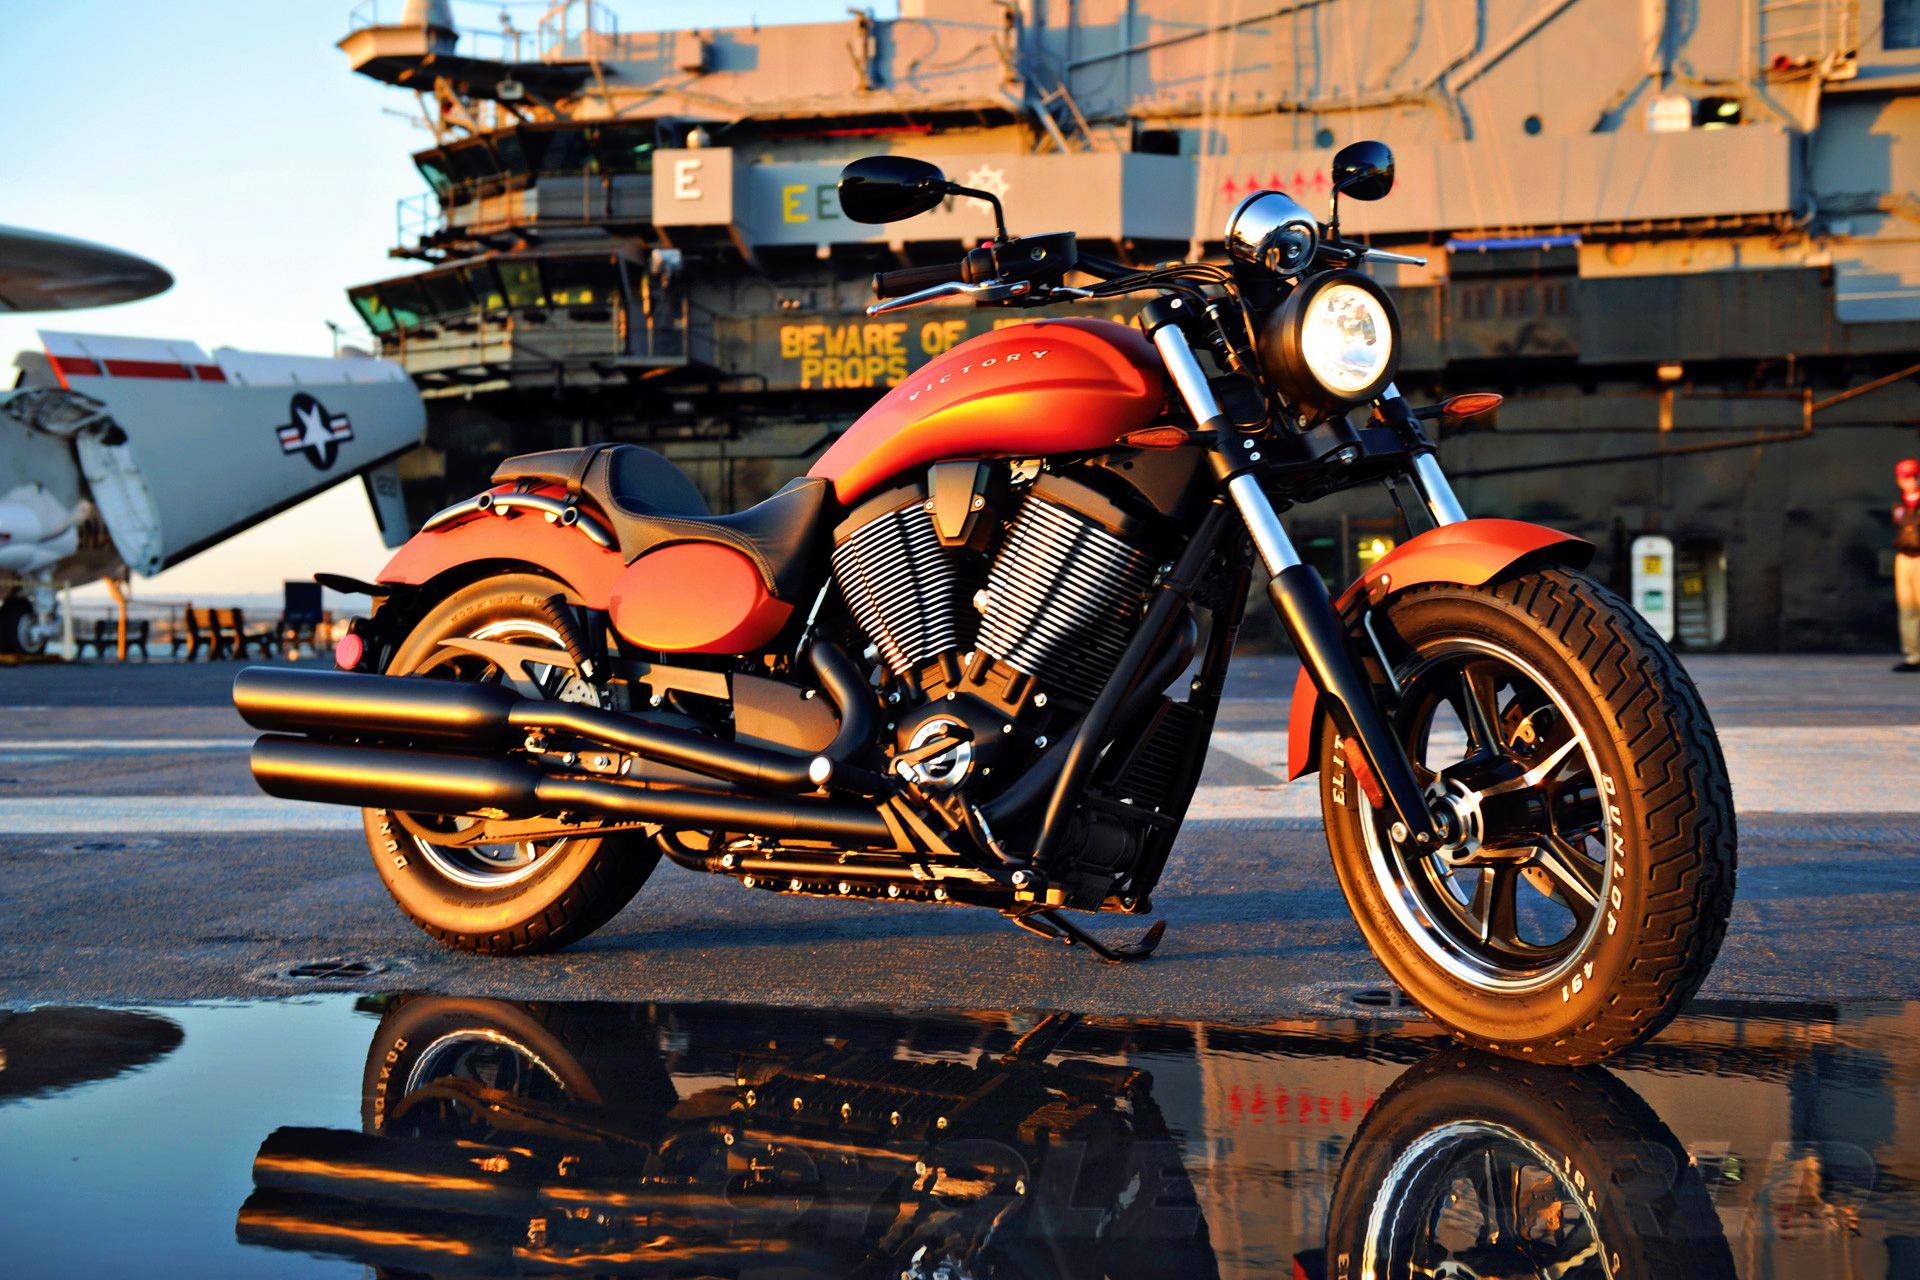 victory motorcycle wallpaper hd 42864